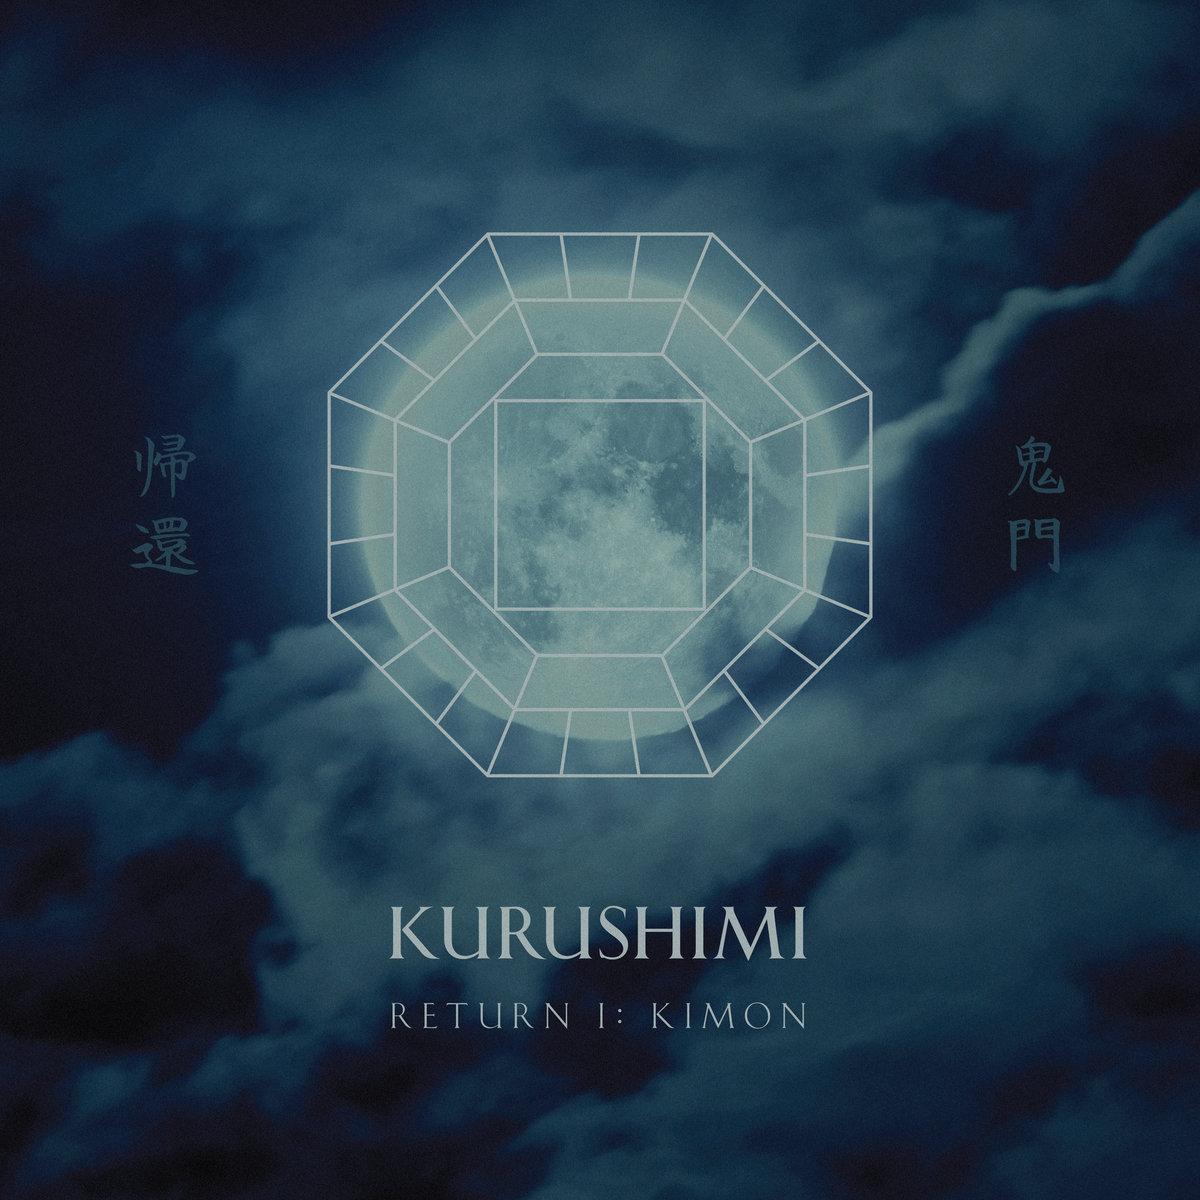 'Return 1: Kimon'